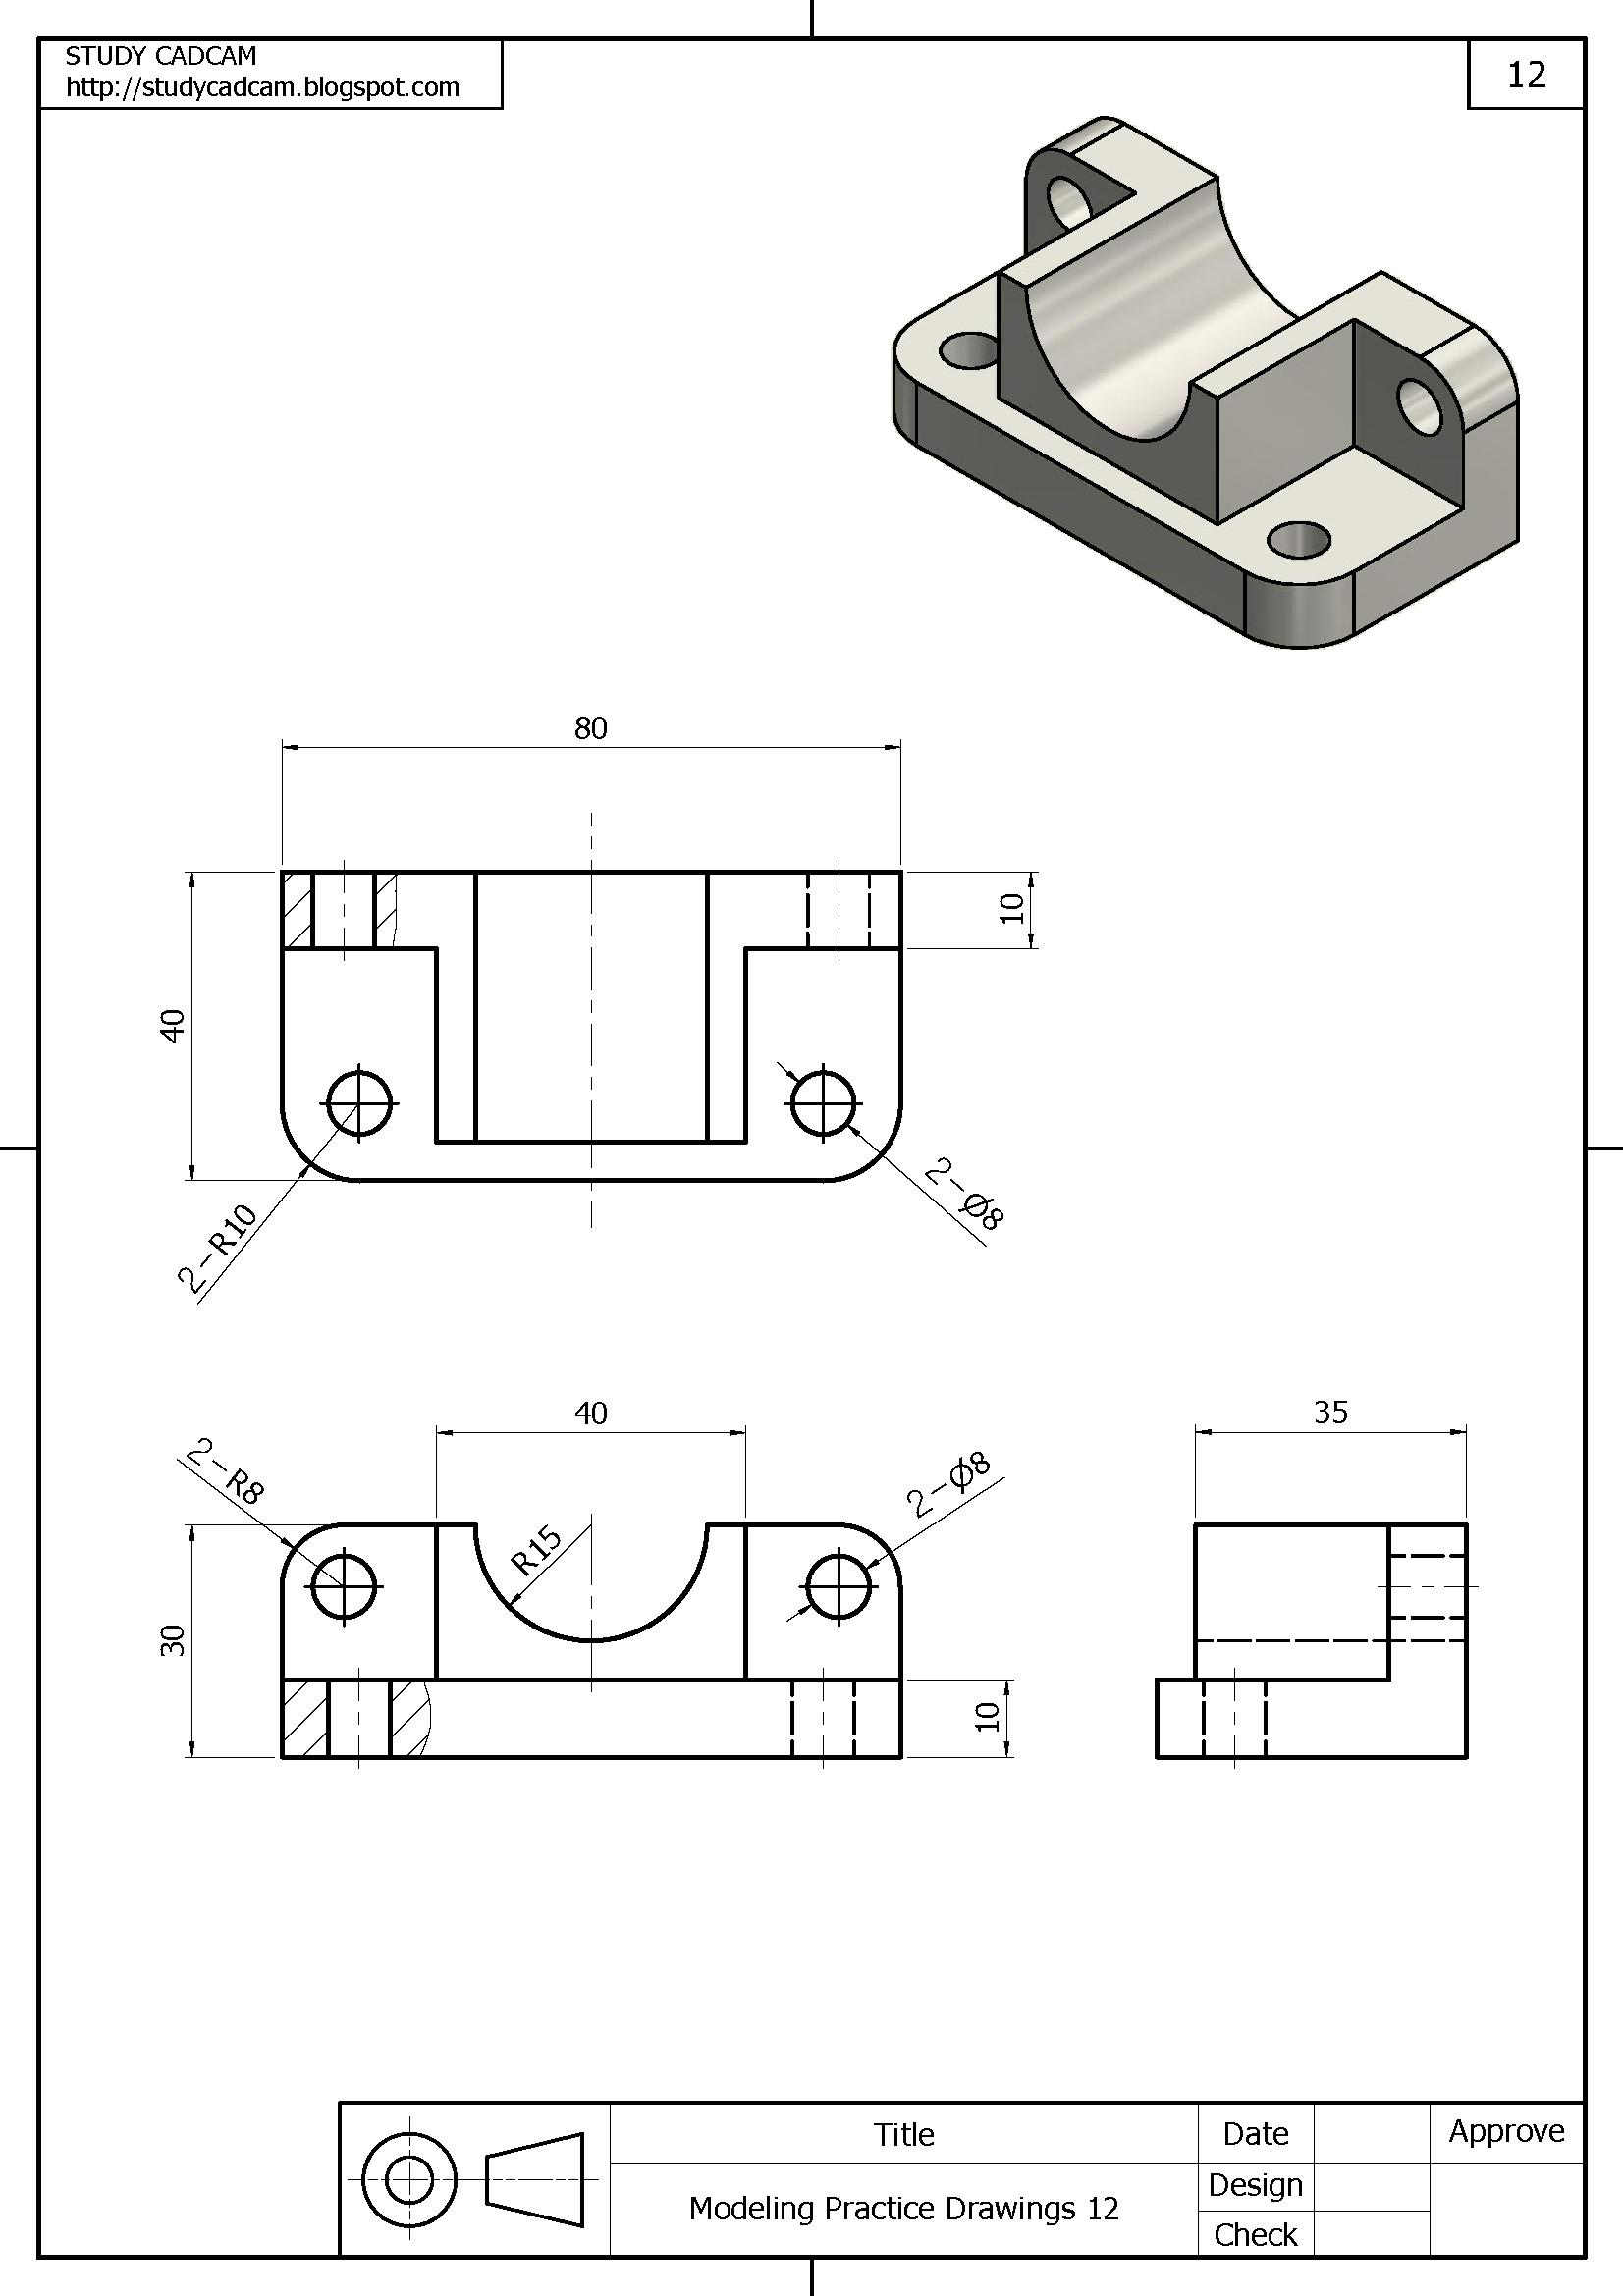 Pin de study cadcan en 3d modeling practice pinterest for Dibujar planos gratis